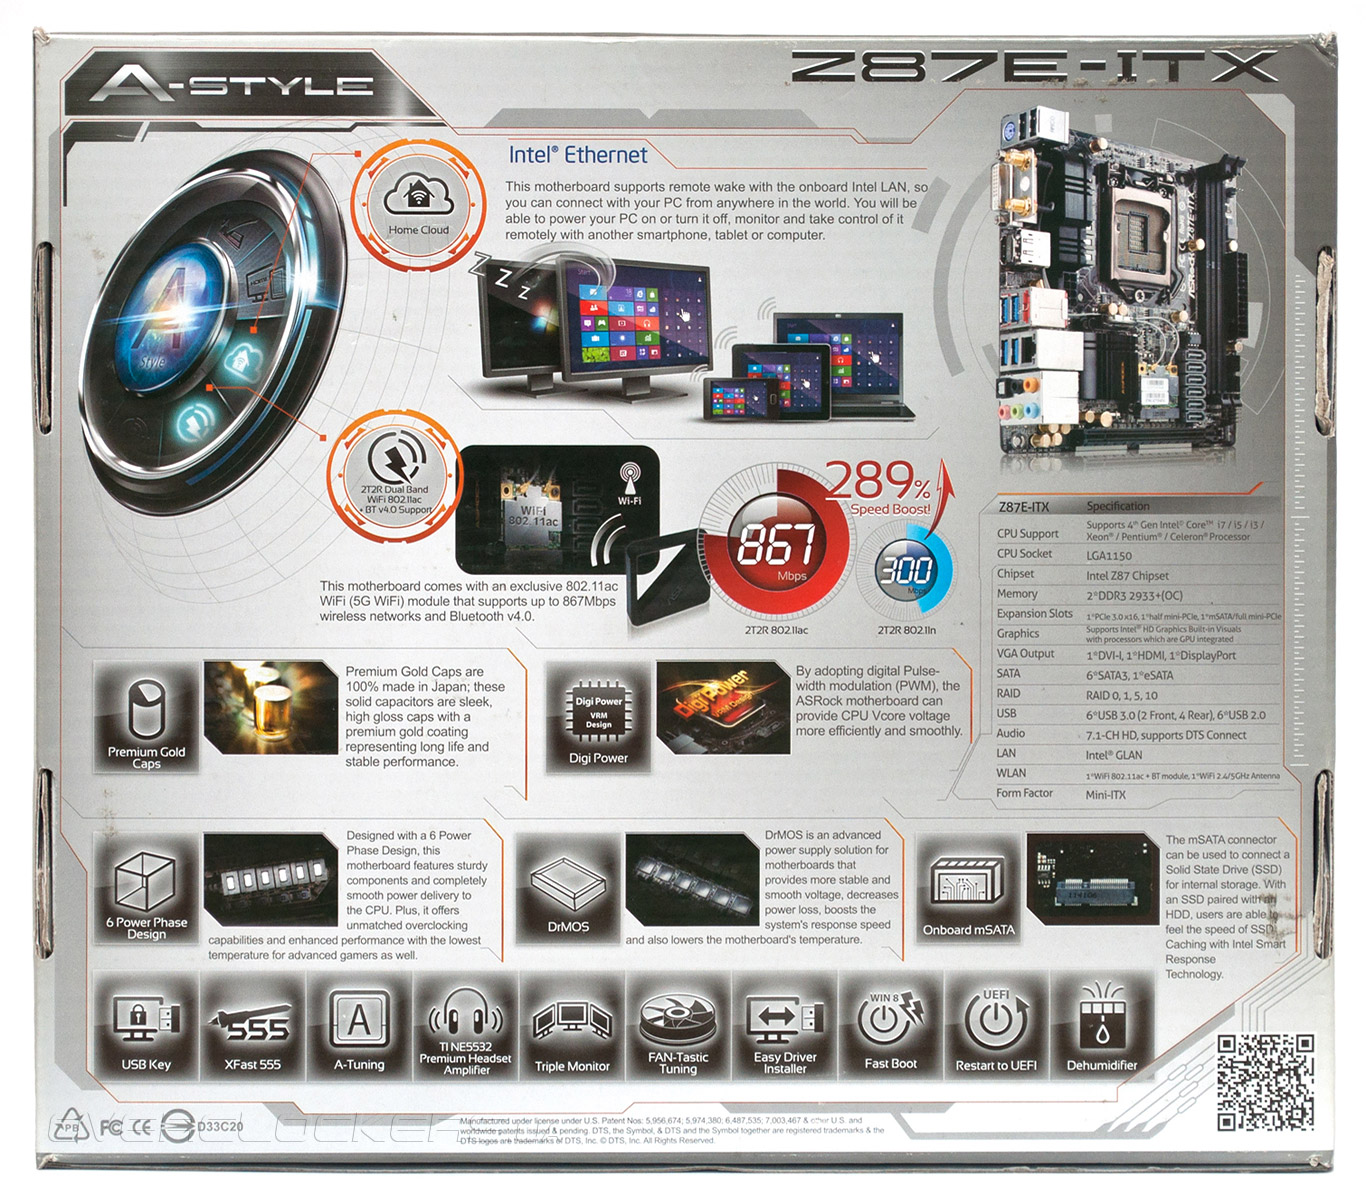 ASROCK Z87E-ITX INTEL GRAPHICS TREIBER HERUNTERLADEN